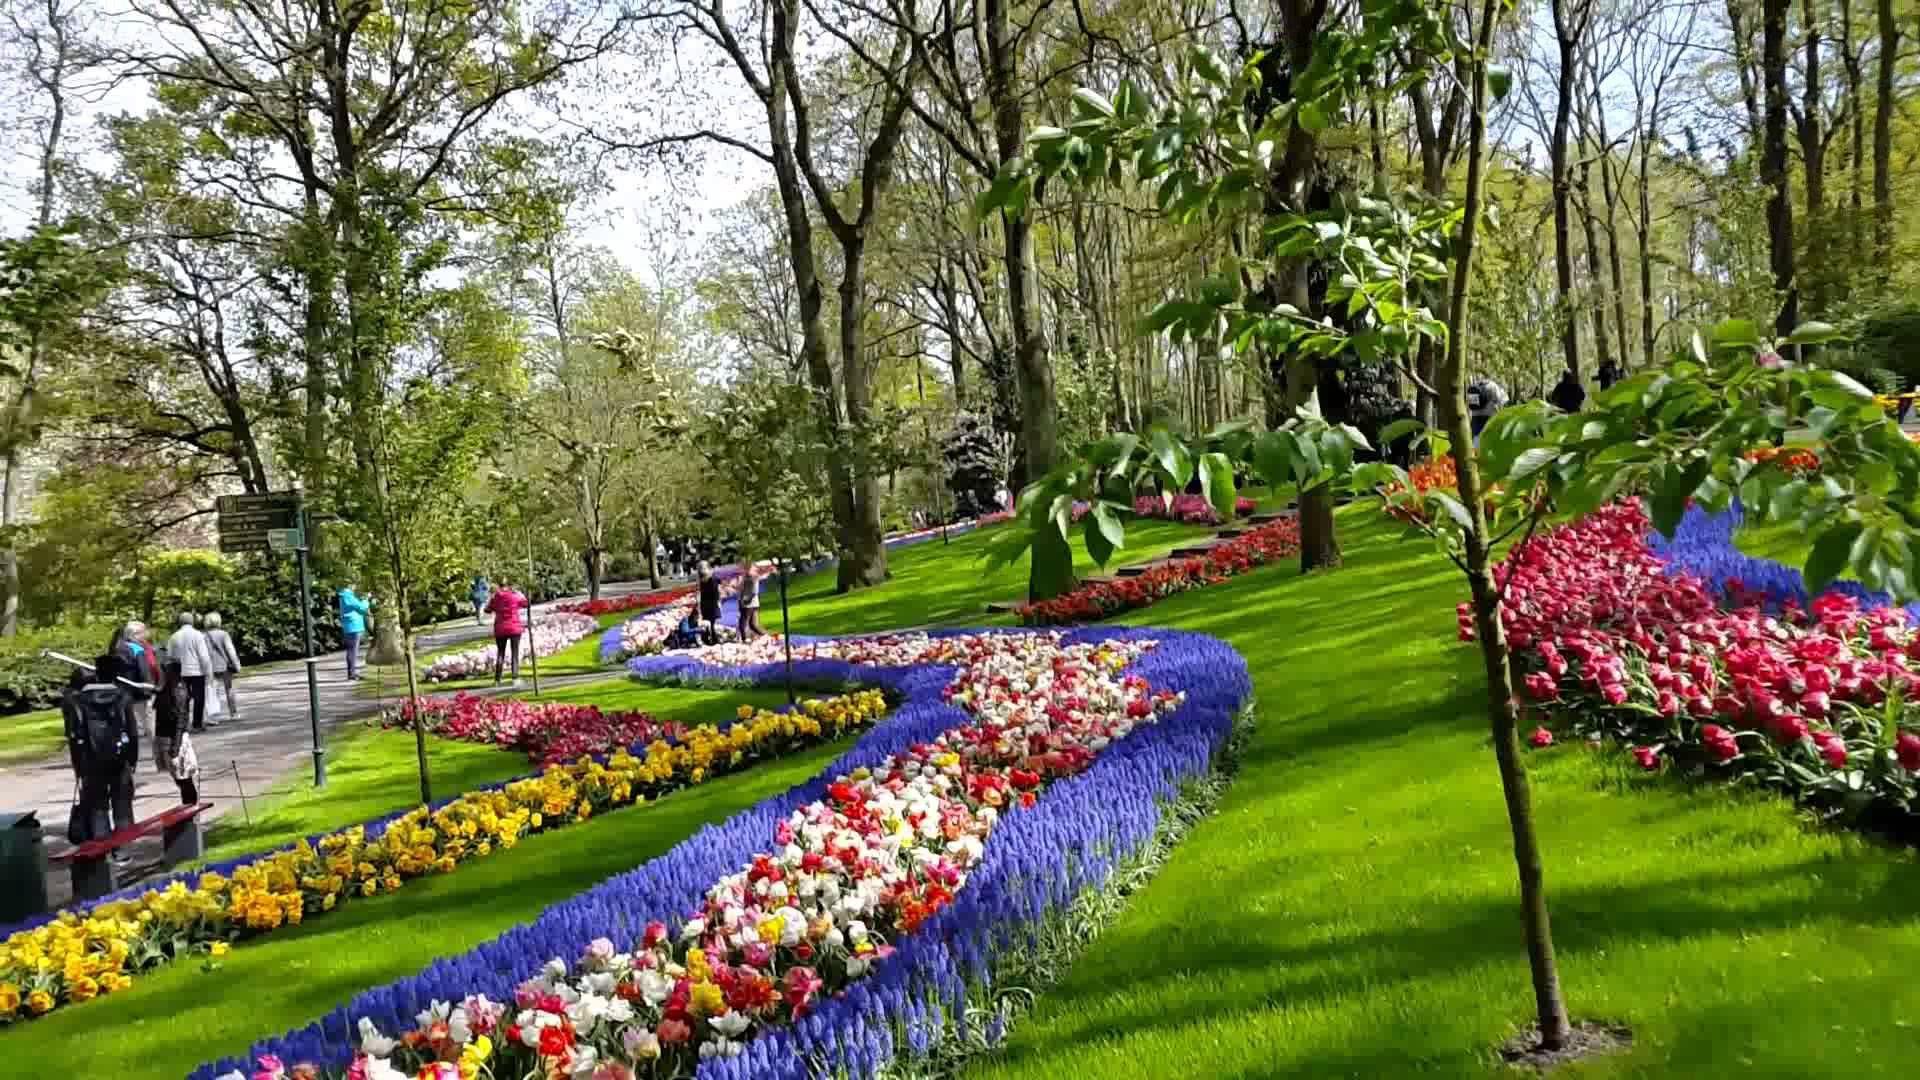 Fondo de pantalla de jardin de flores de primavera for Fondo de pantalla primavera